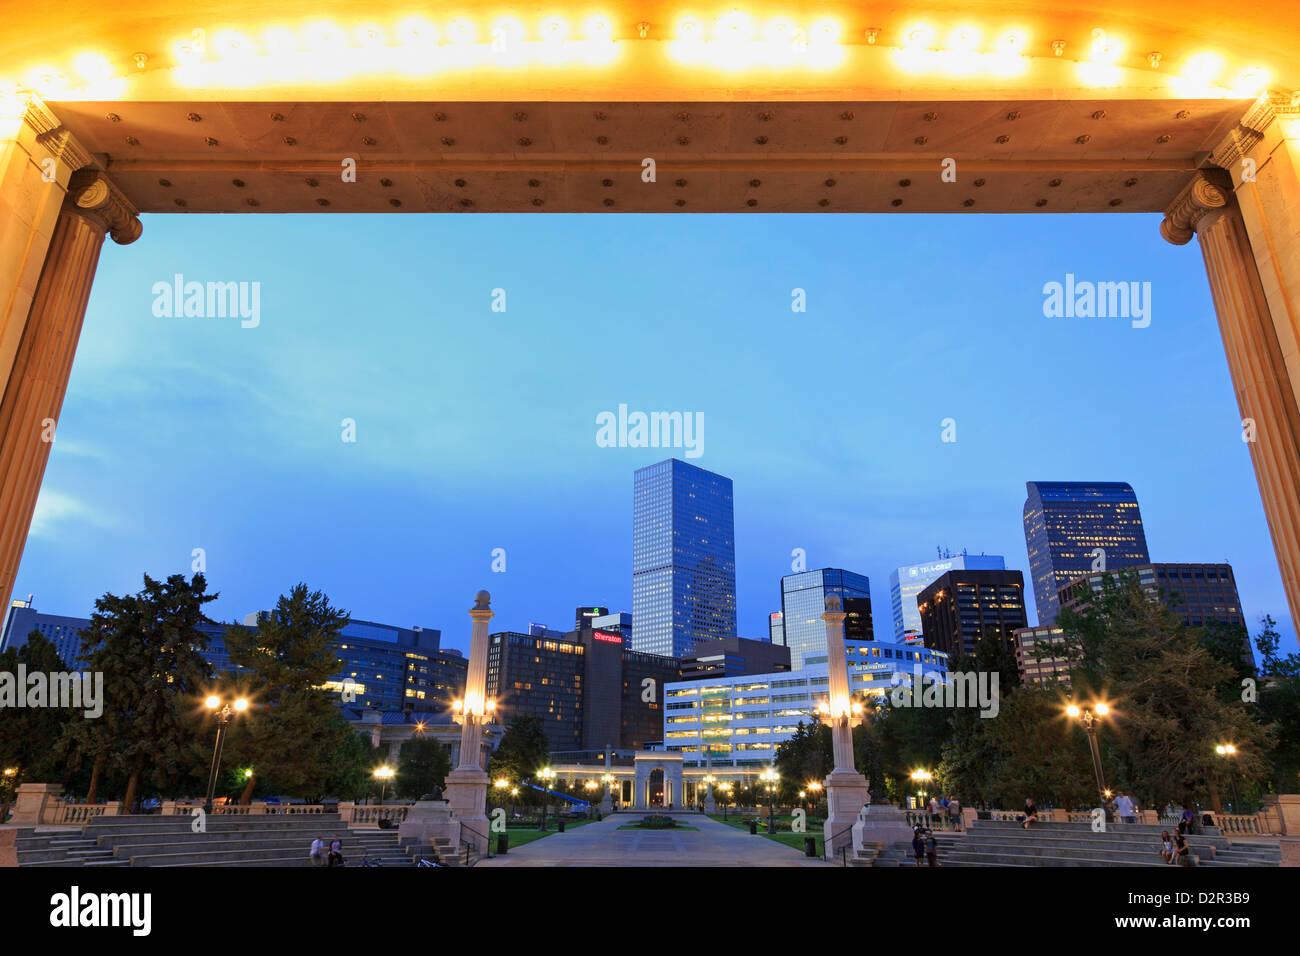 Civic Center Park and skyline, Denver, Colorado, United States of America, North America - Stock Image